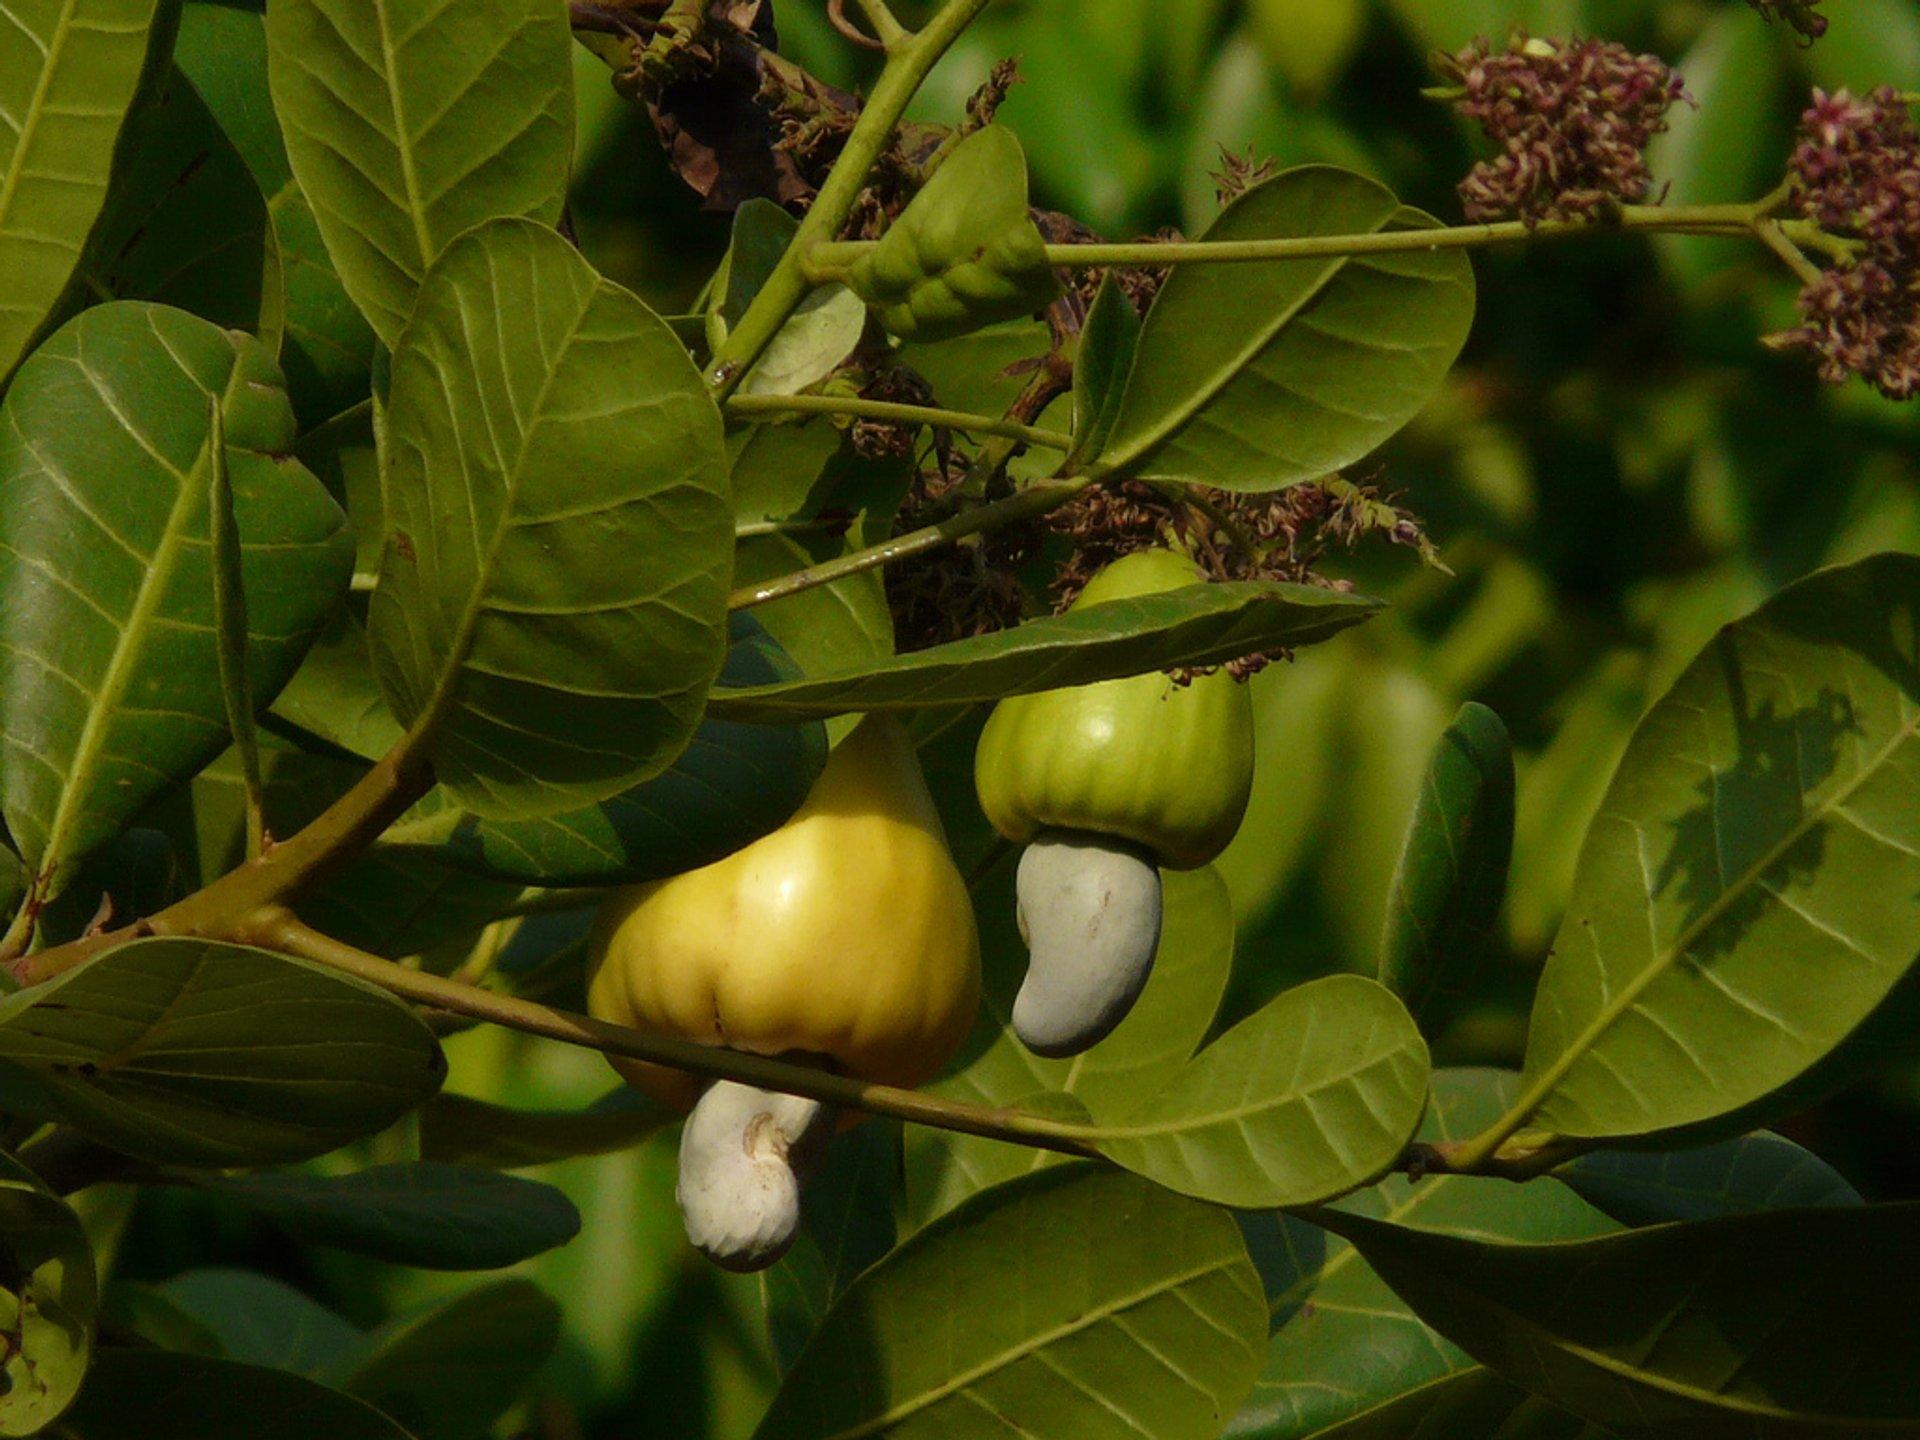 Cashew Fruit in Honduras 2020 - Best Time